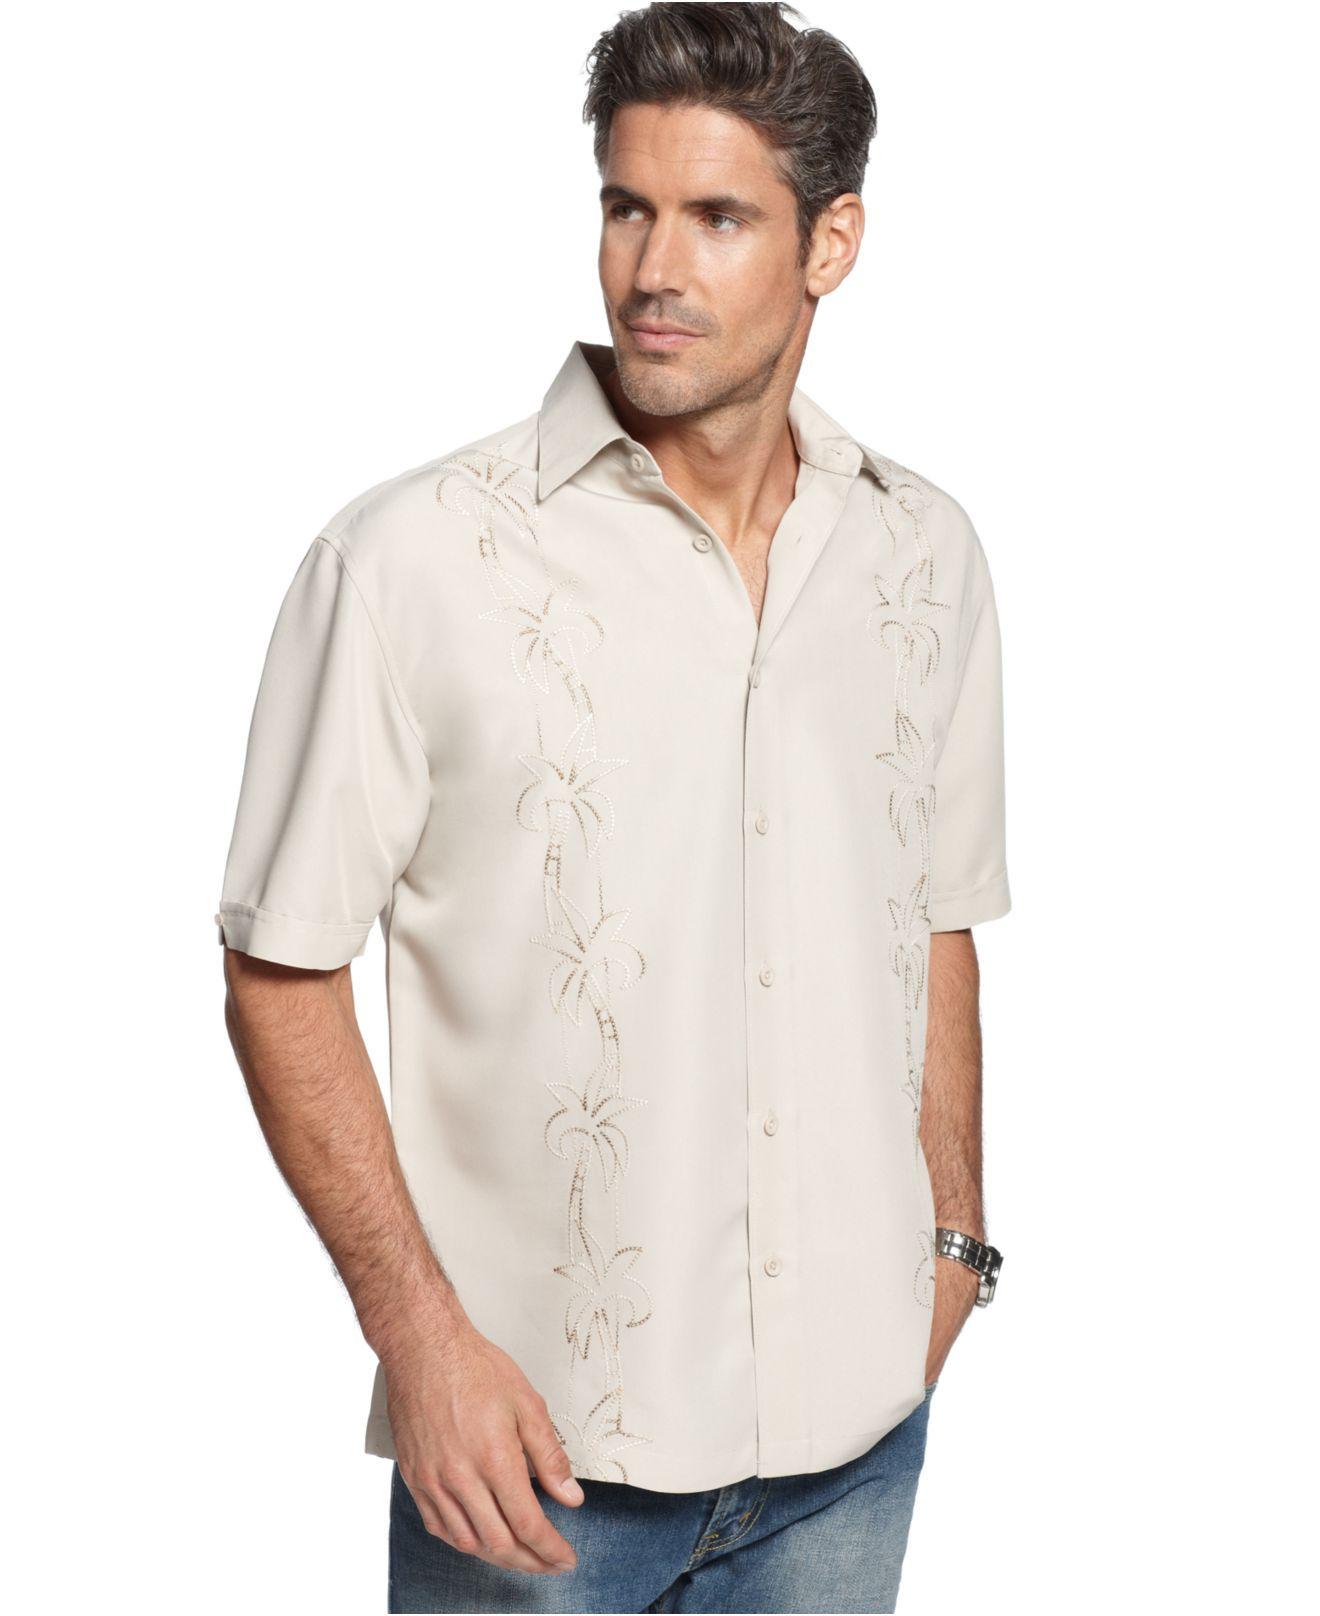 Cubavera Shirt, Embroidered Palm Tree Shirt - Mens Casual Shirts ...